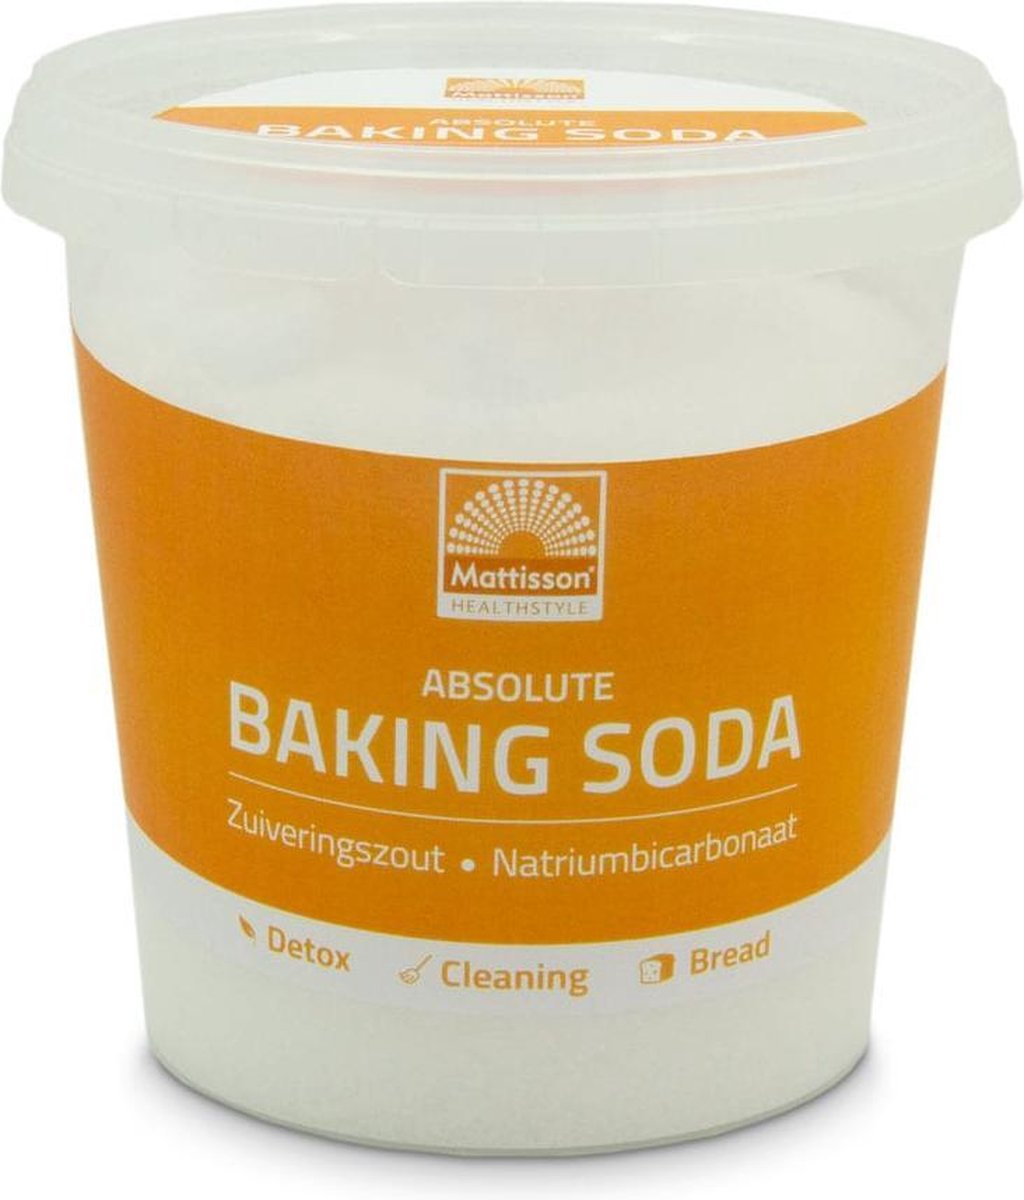 Mattisson - Baking Soda - Zuiveringszout Natriumbicarbonaat